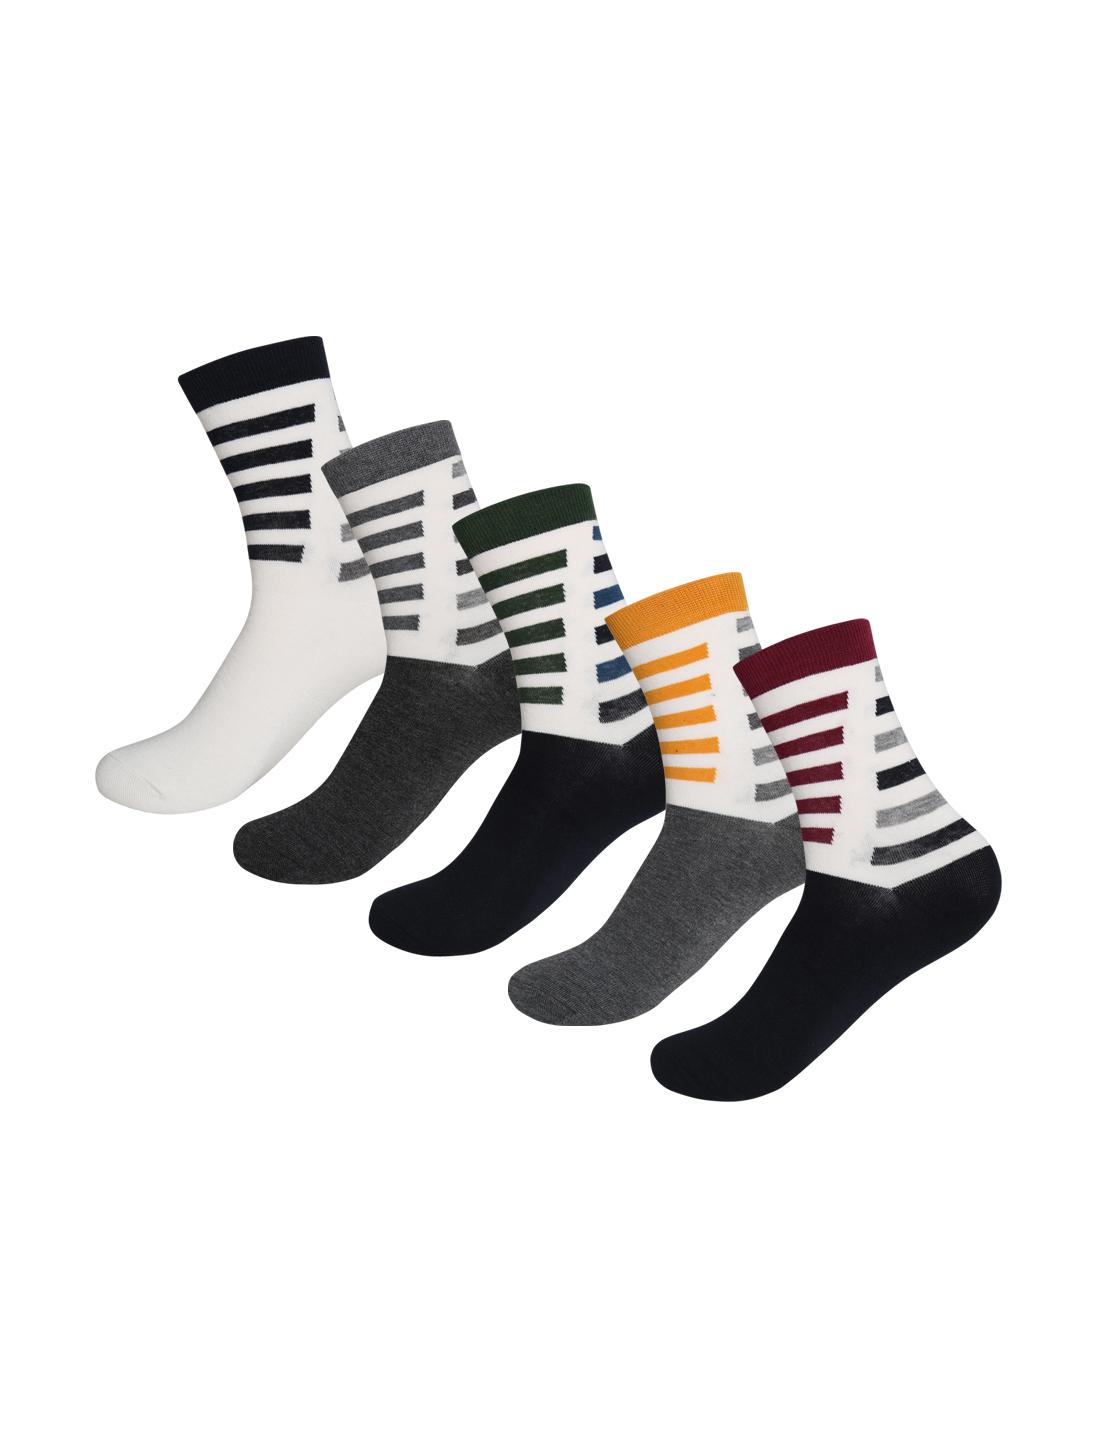 Men 5 Pack Slash Stripes Pattern Thermal Crew Socks 10-12 Assorted-Slash